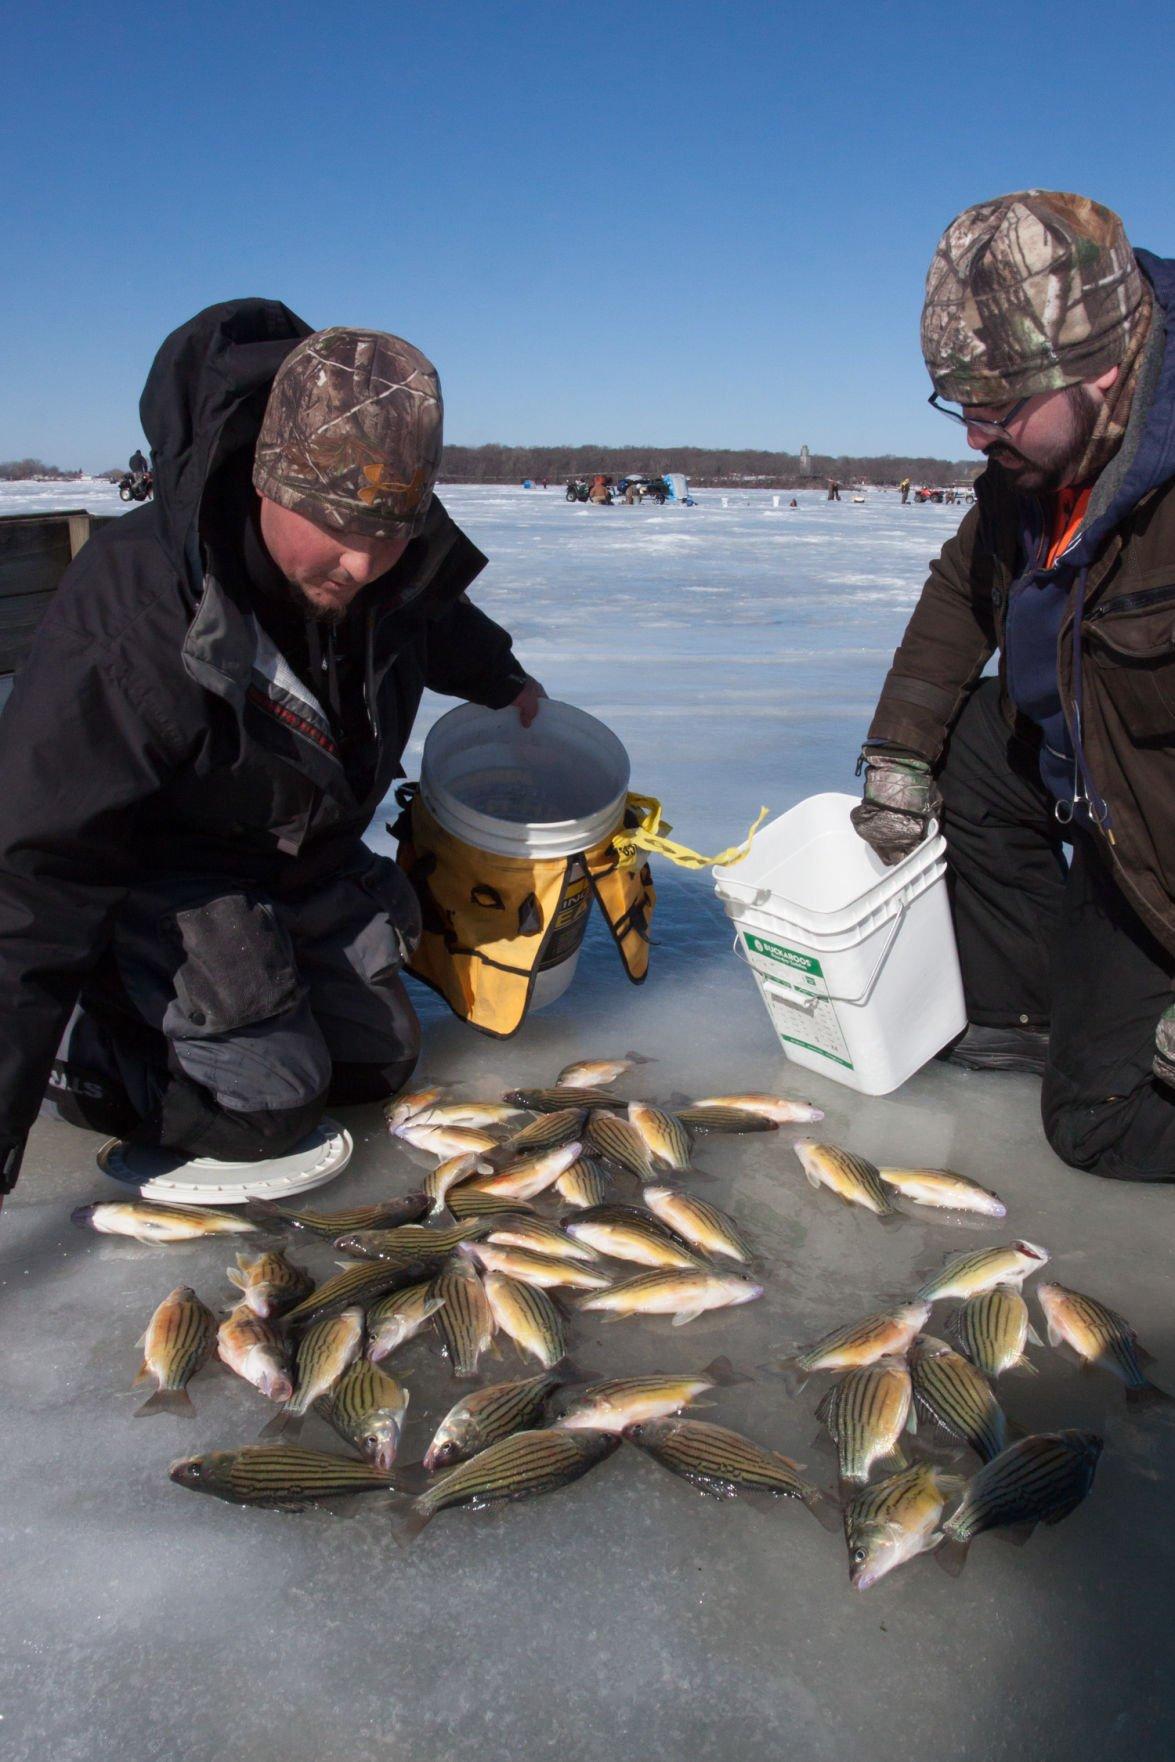 Photos yellow bass bonanza ice fishing tournament north for Ice fishing tournament